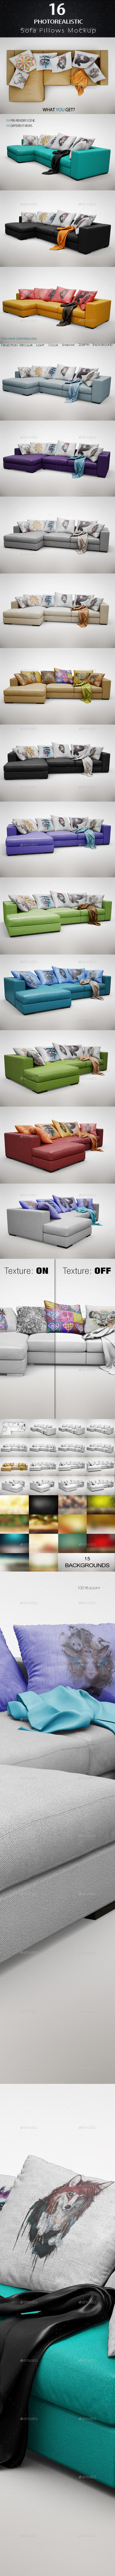 Sofa Pillows MockUp - Product Mock-Ups Graphics